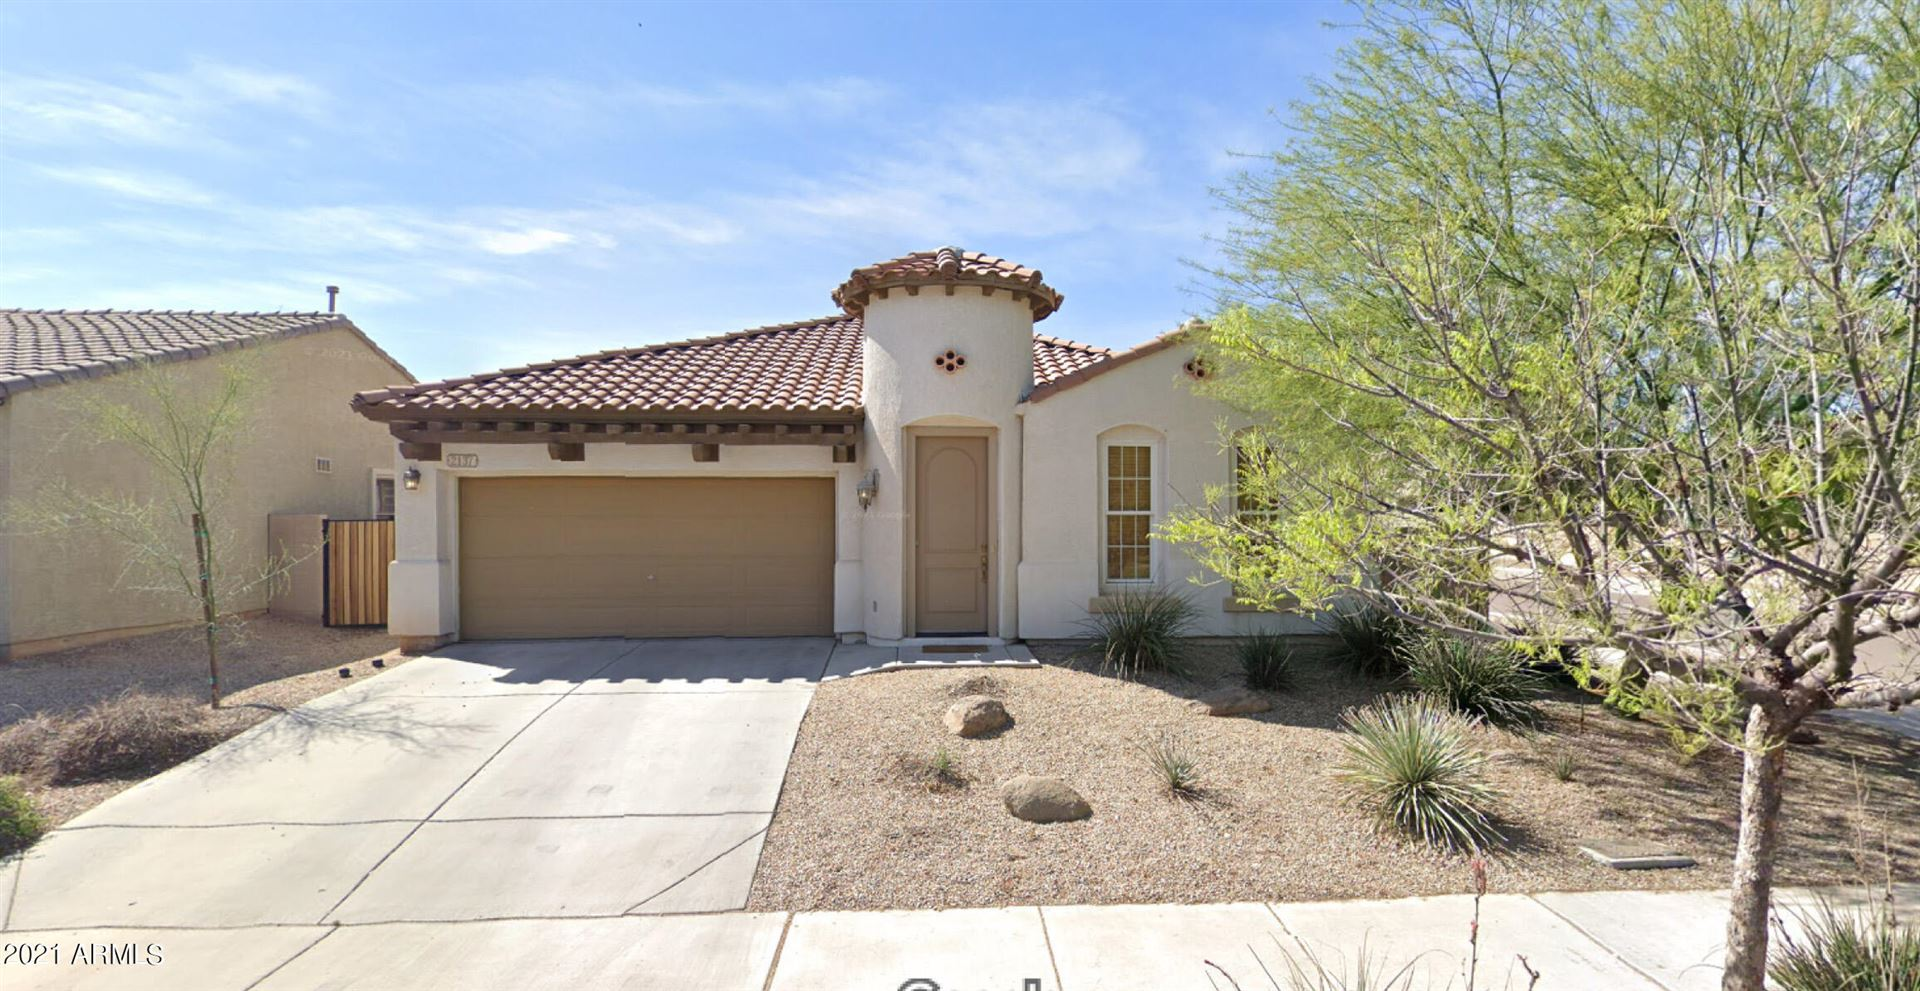 2137 E LA SALLE Street, Phoenix, AZ 85040 - MLS#: 6261936